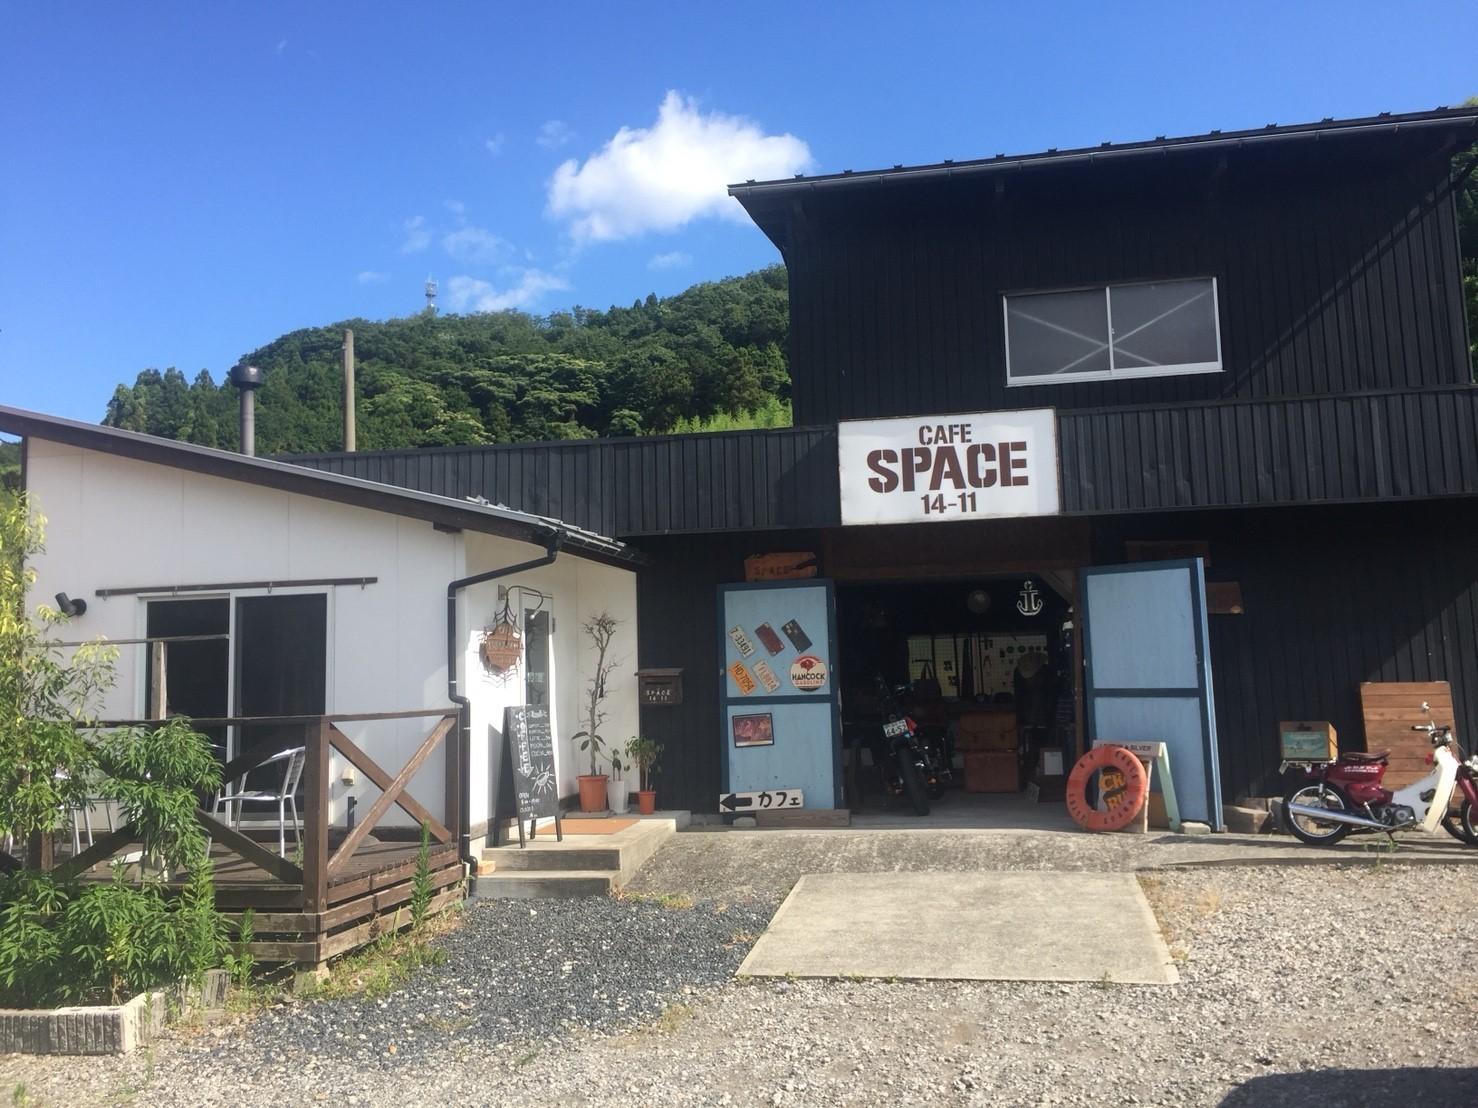 CAFE SPACE 14-11_e0115904_16252837.jpg